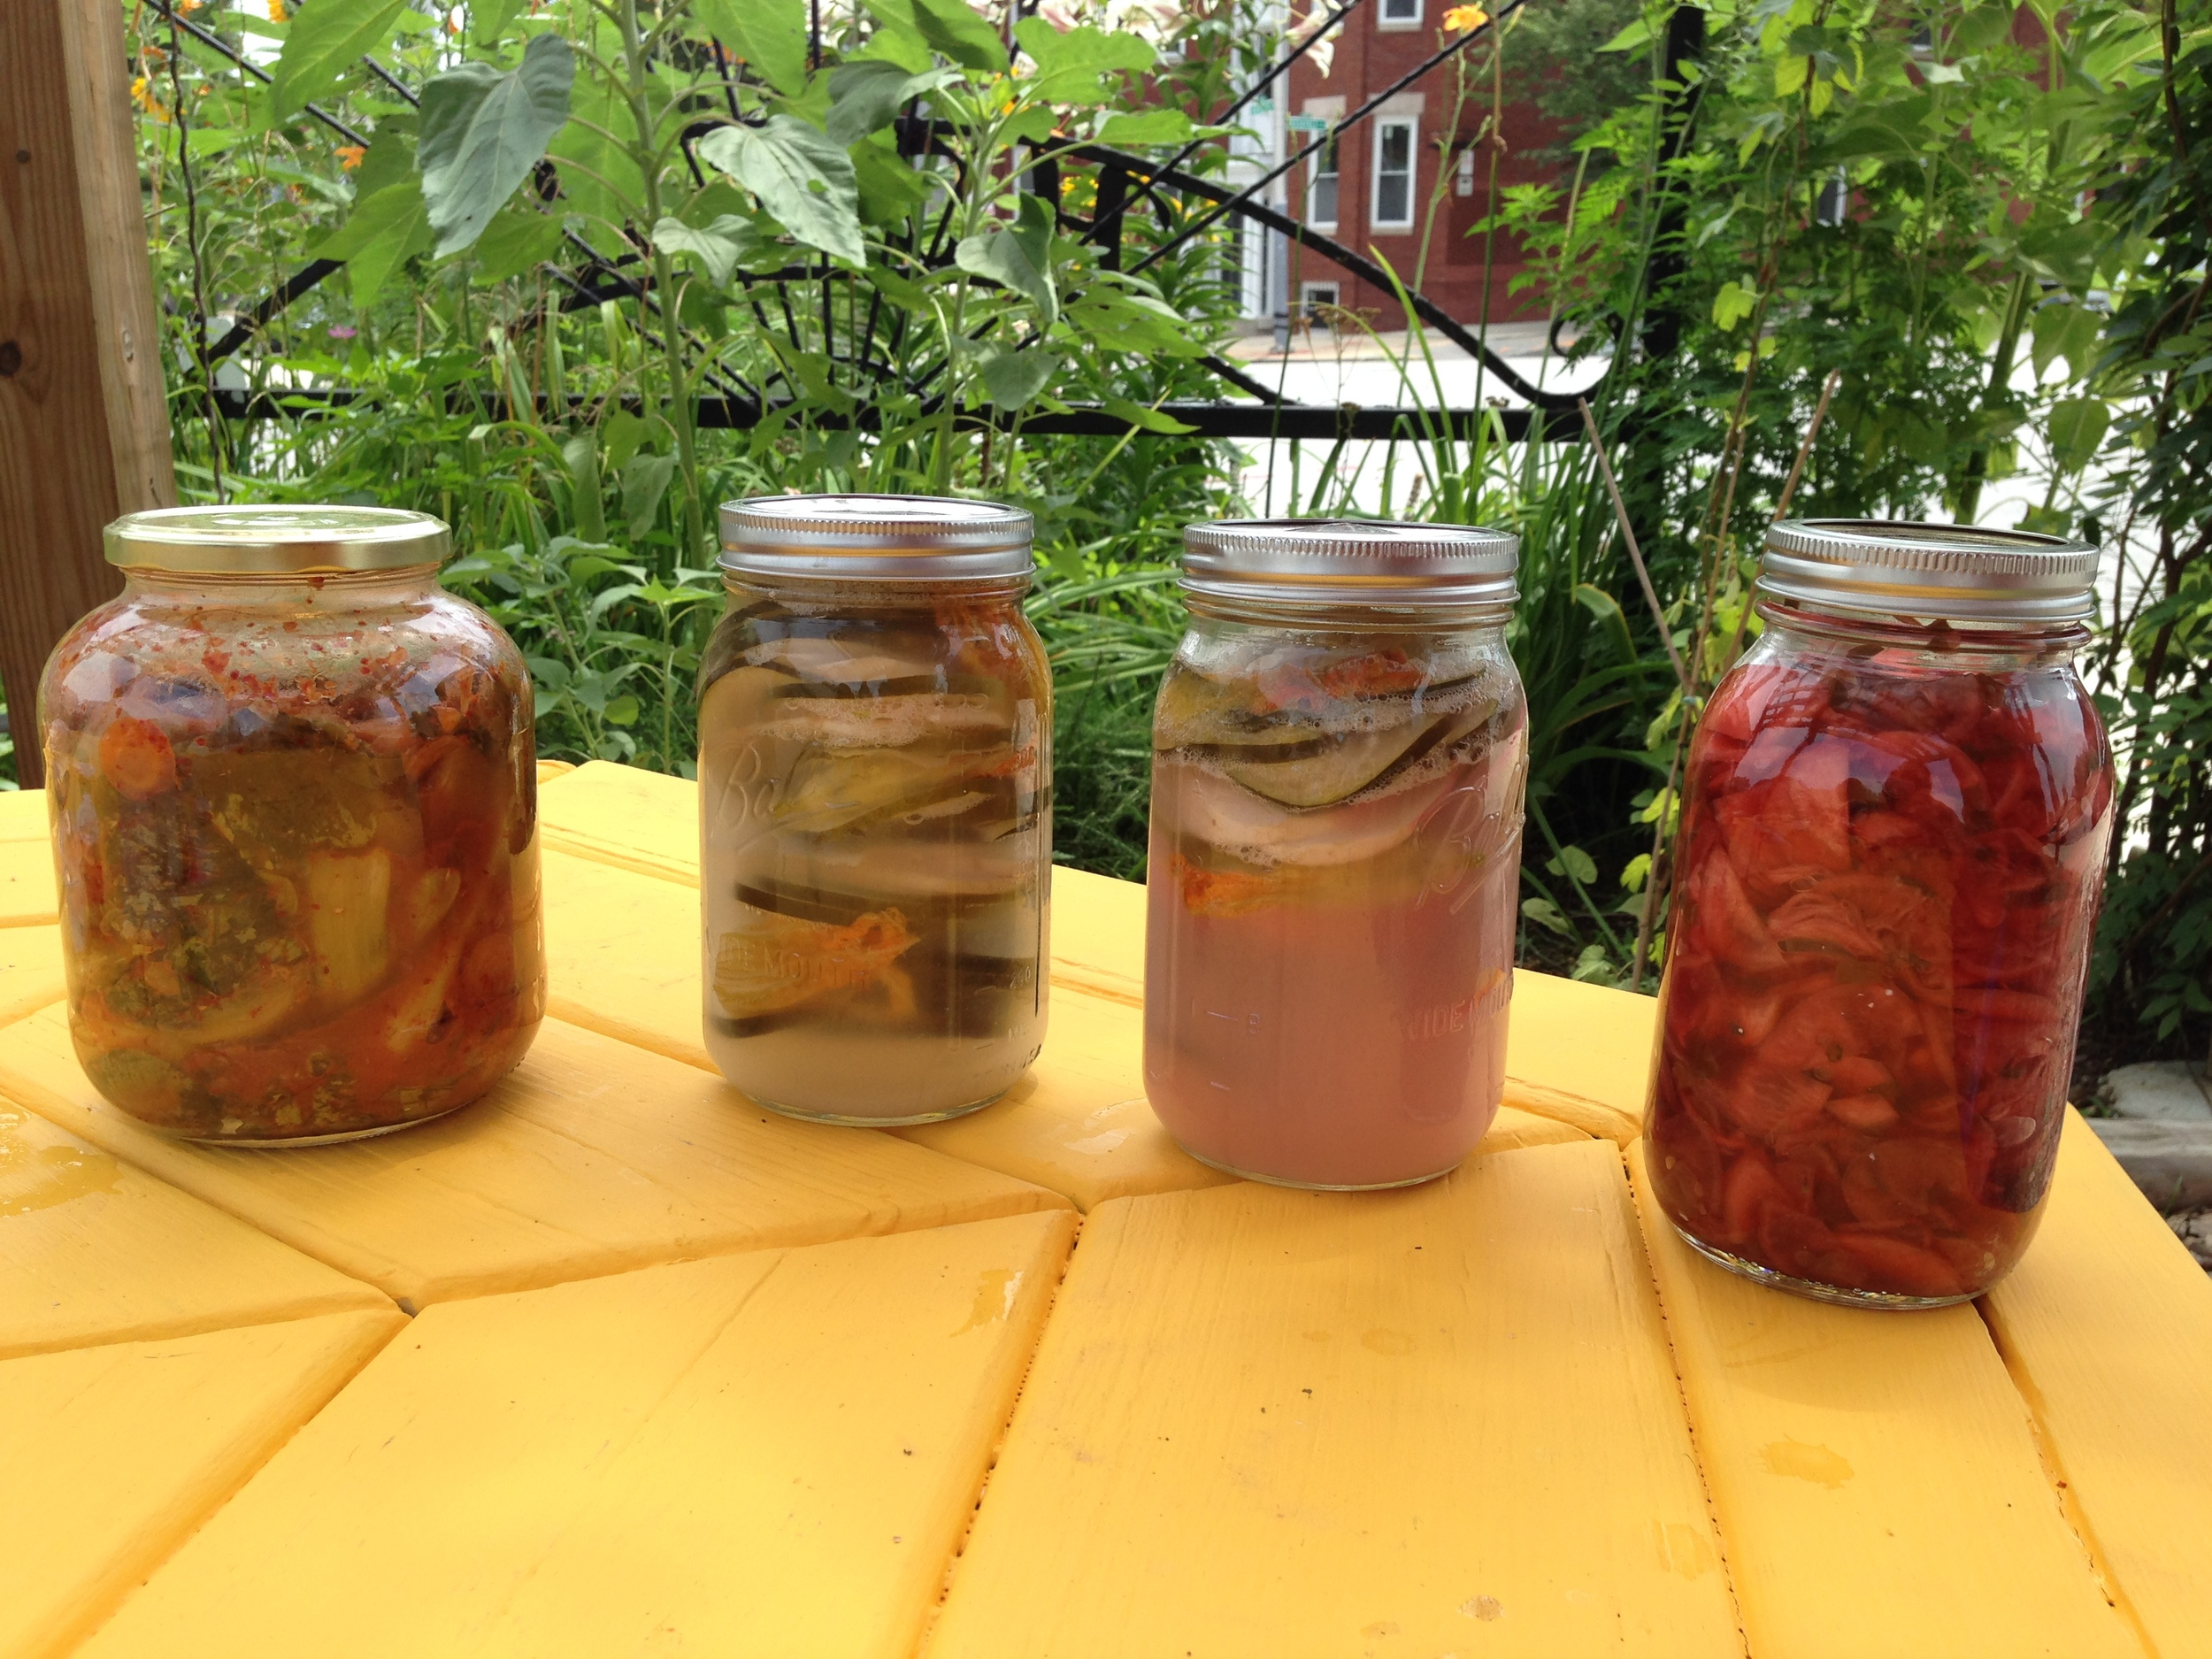 (left to right) Kimchi, Zucchini Turnip Pickle x 2, Turnip Radish Pickle